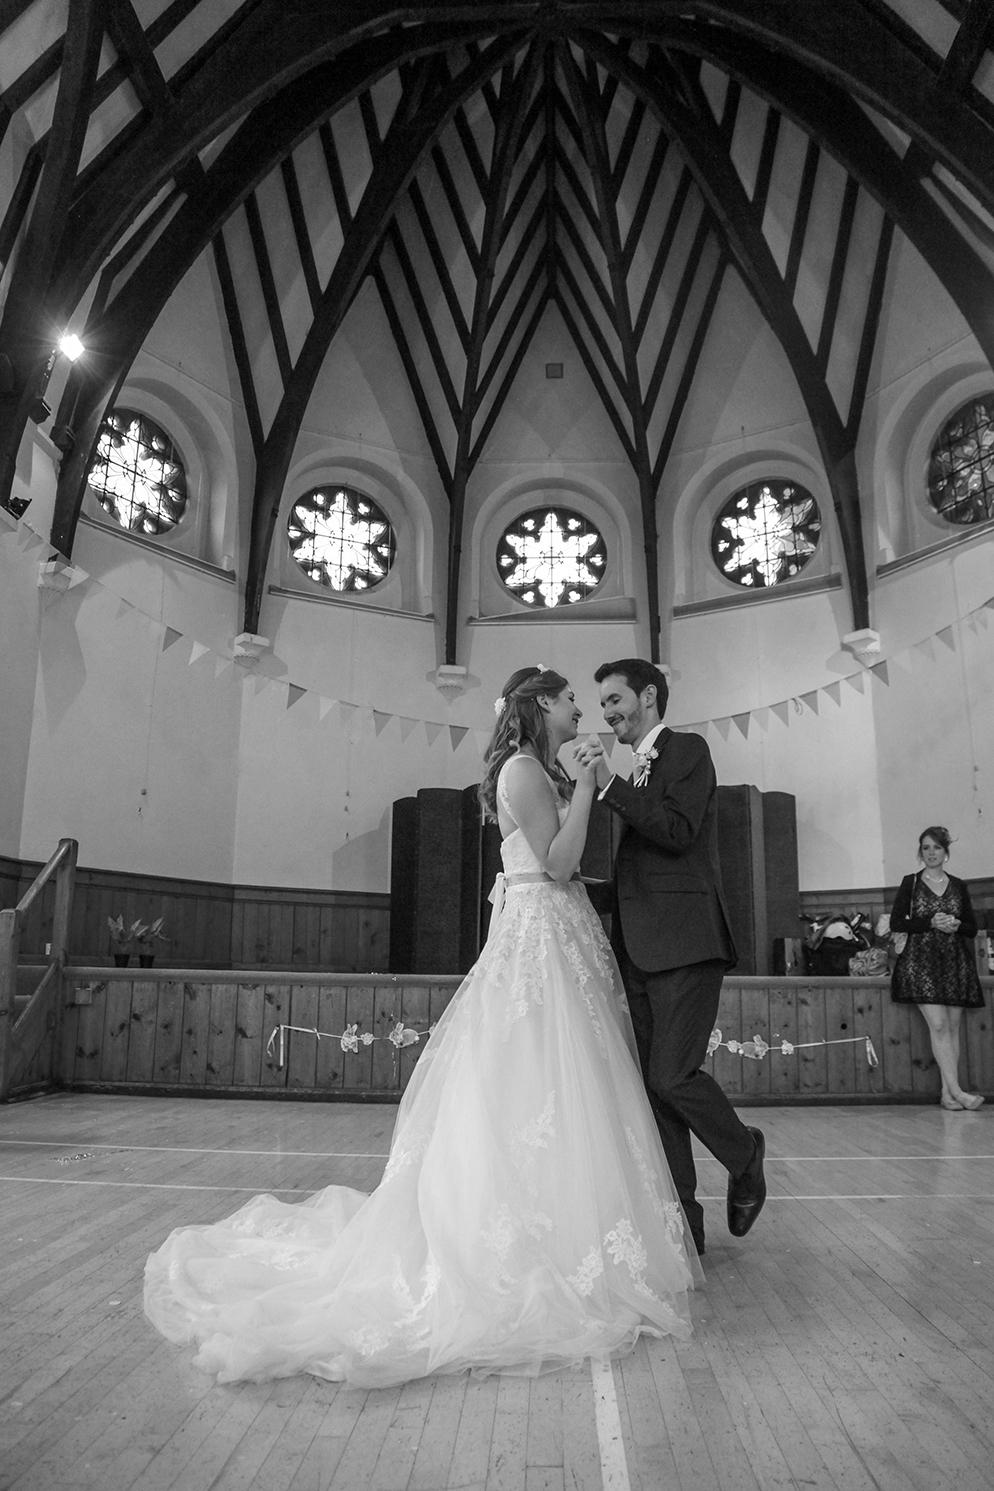 ian_wade_weddings 402_bw_sm.jpg